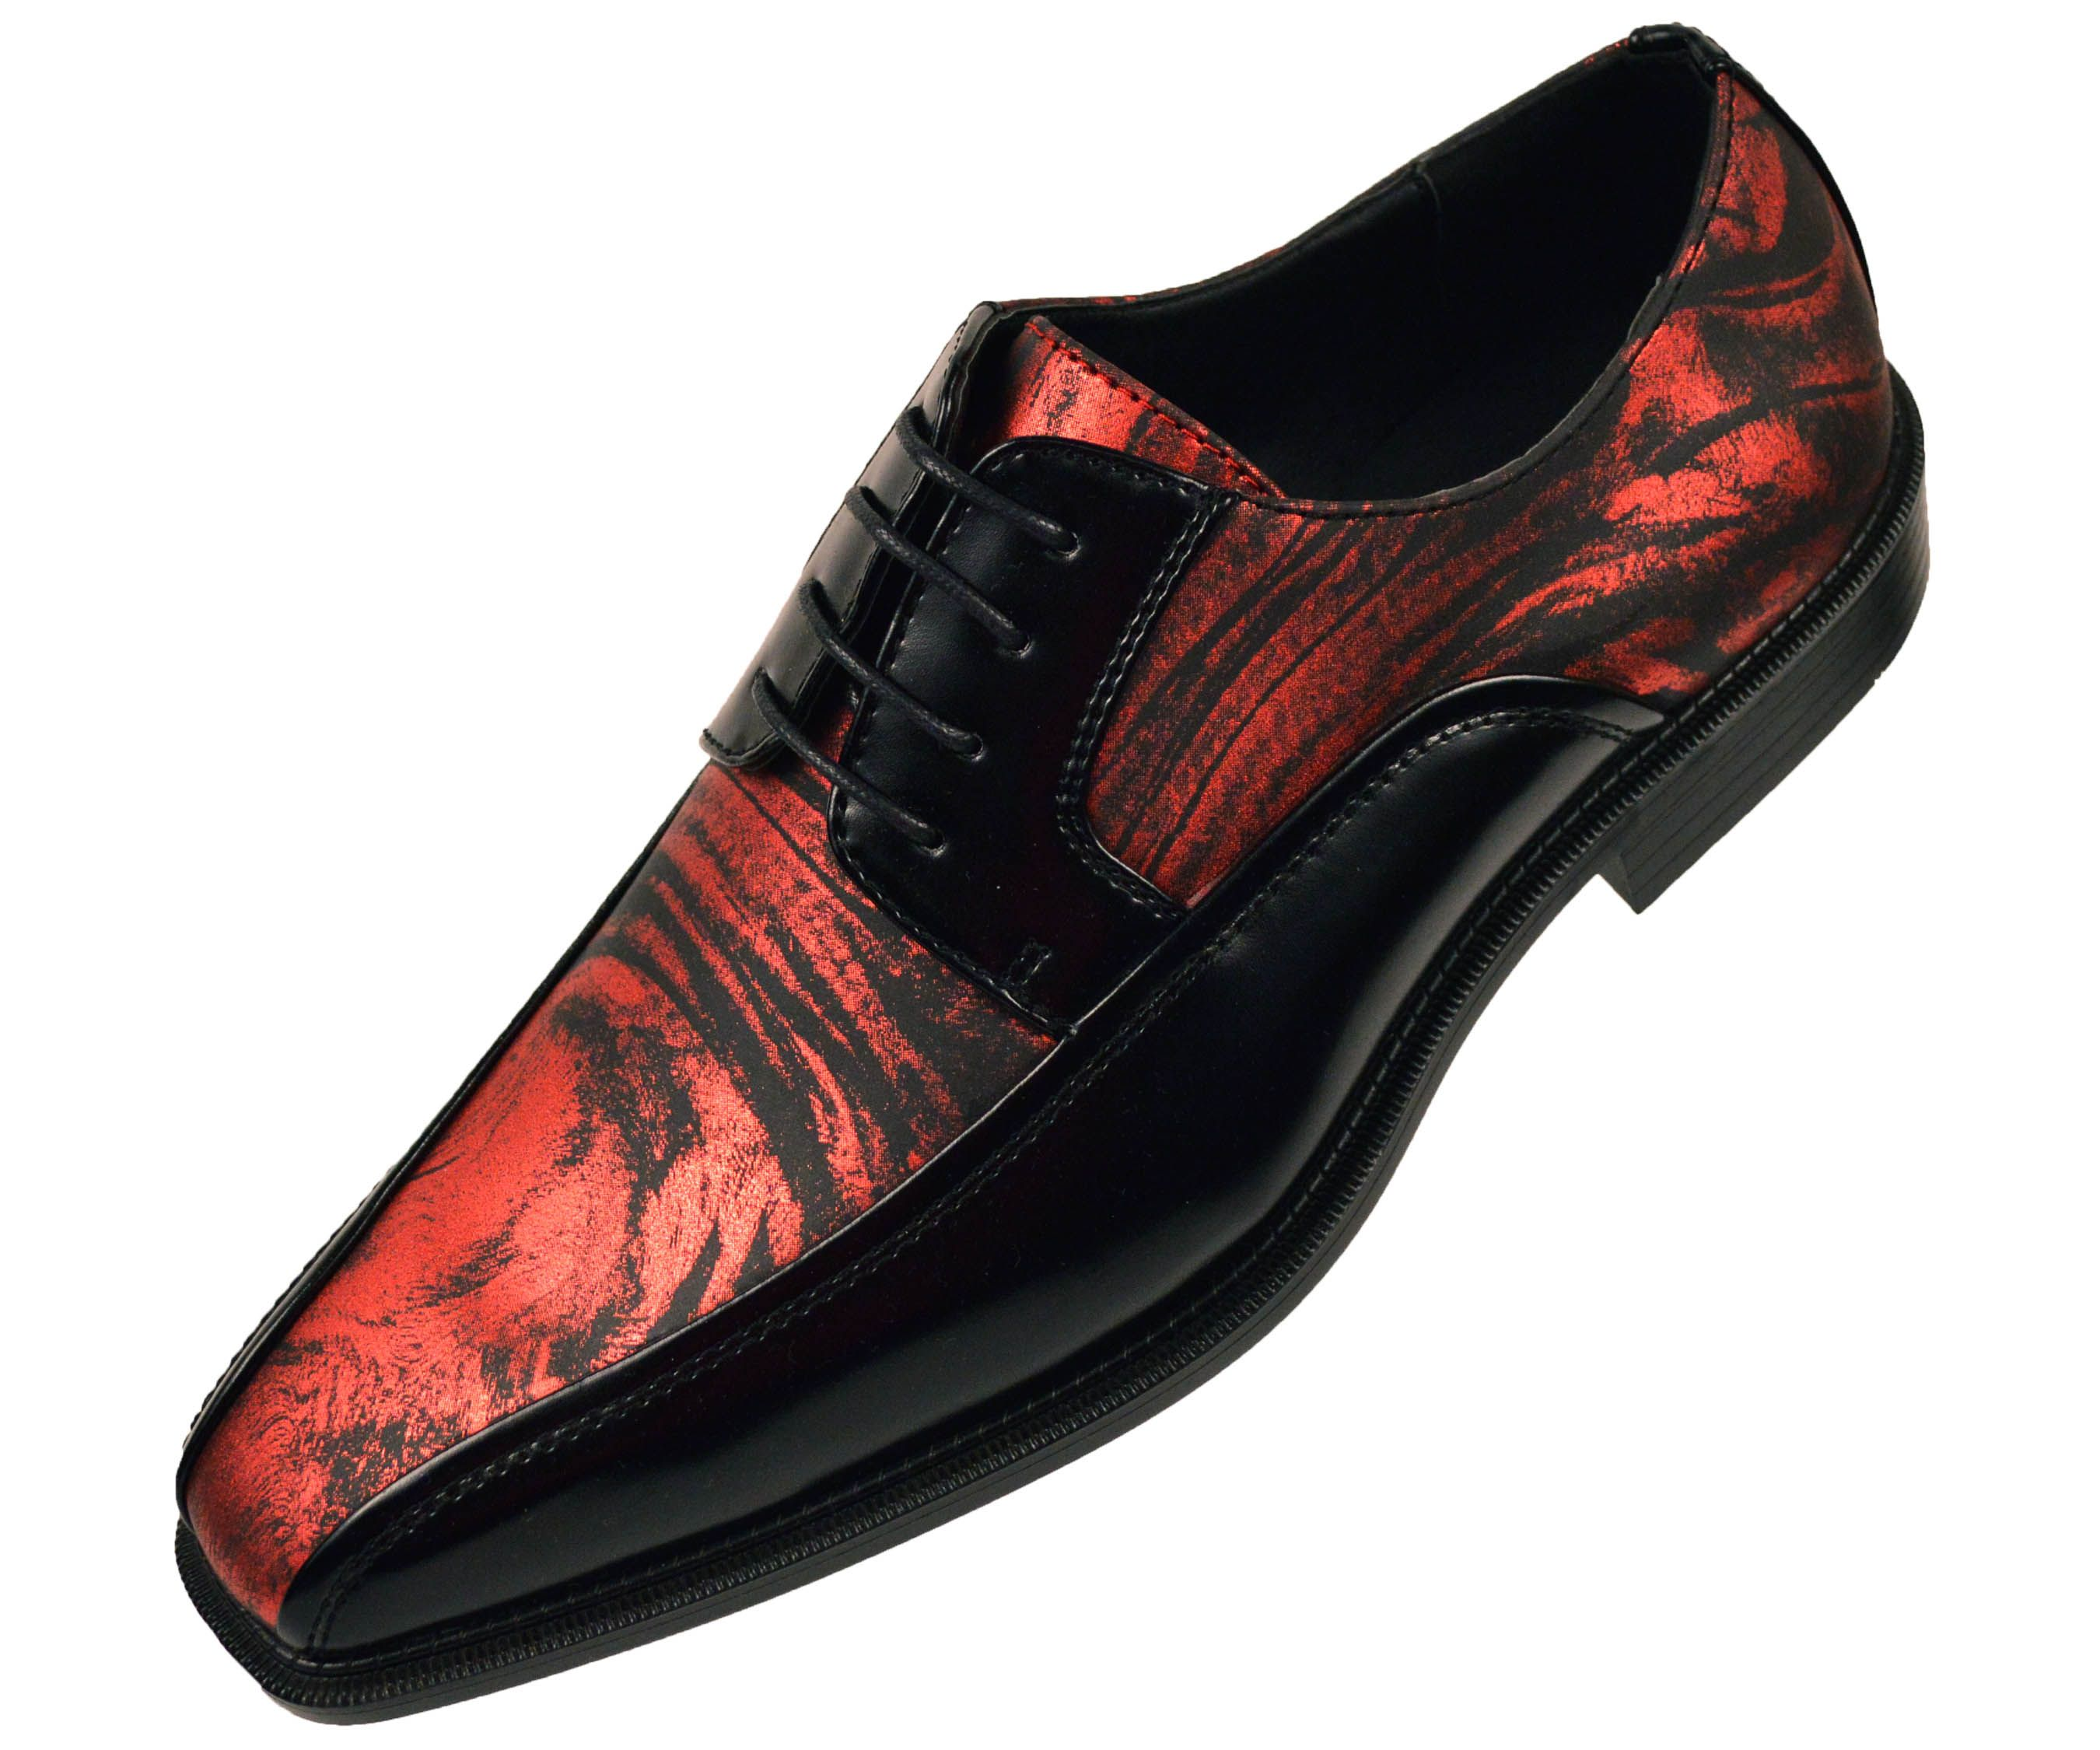 Bolano Bolano Mens Metallic Swirl Printed Formal Oxford Tuxedo Dress Shoe Comfortable Lace Up Design Walmart Com Dress Shoes Men Oxford Shoes Men Dress Shoes [ 2250 x 2700 Pixel ]